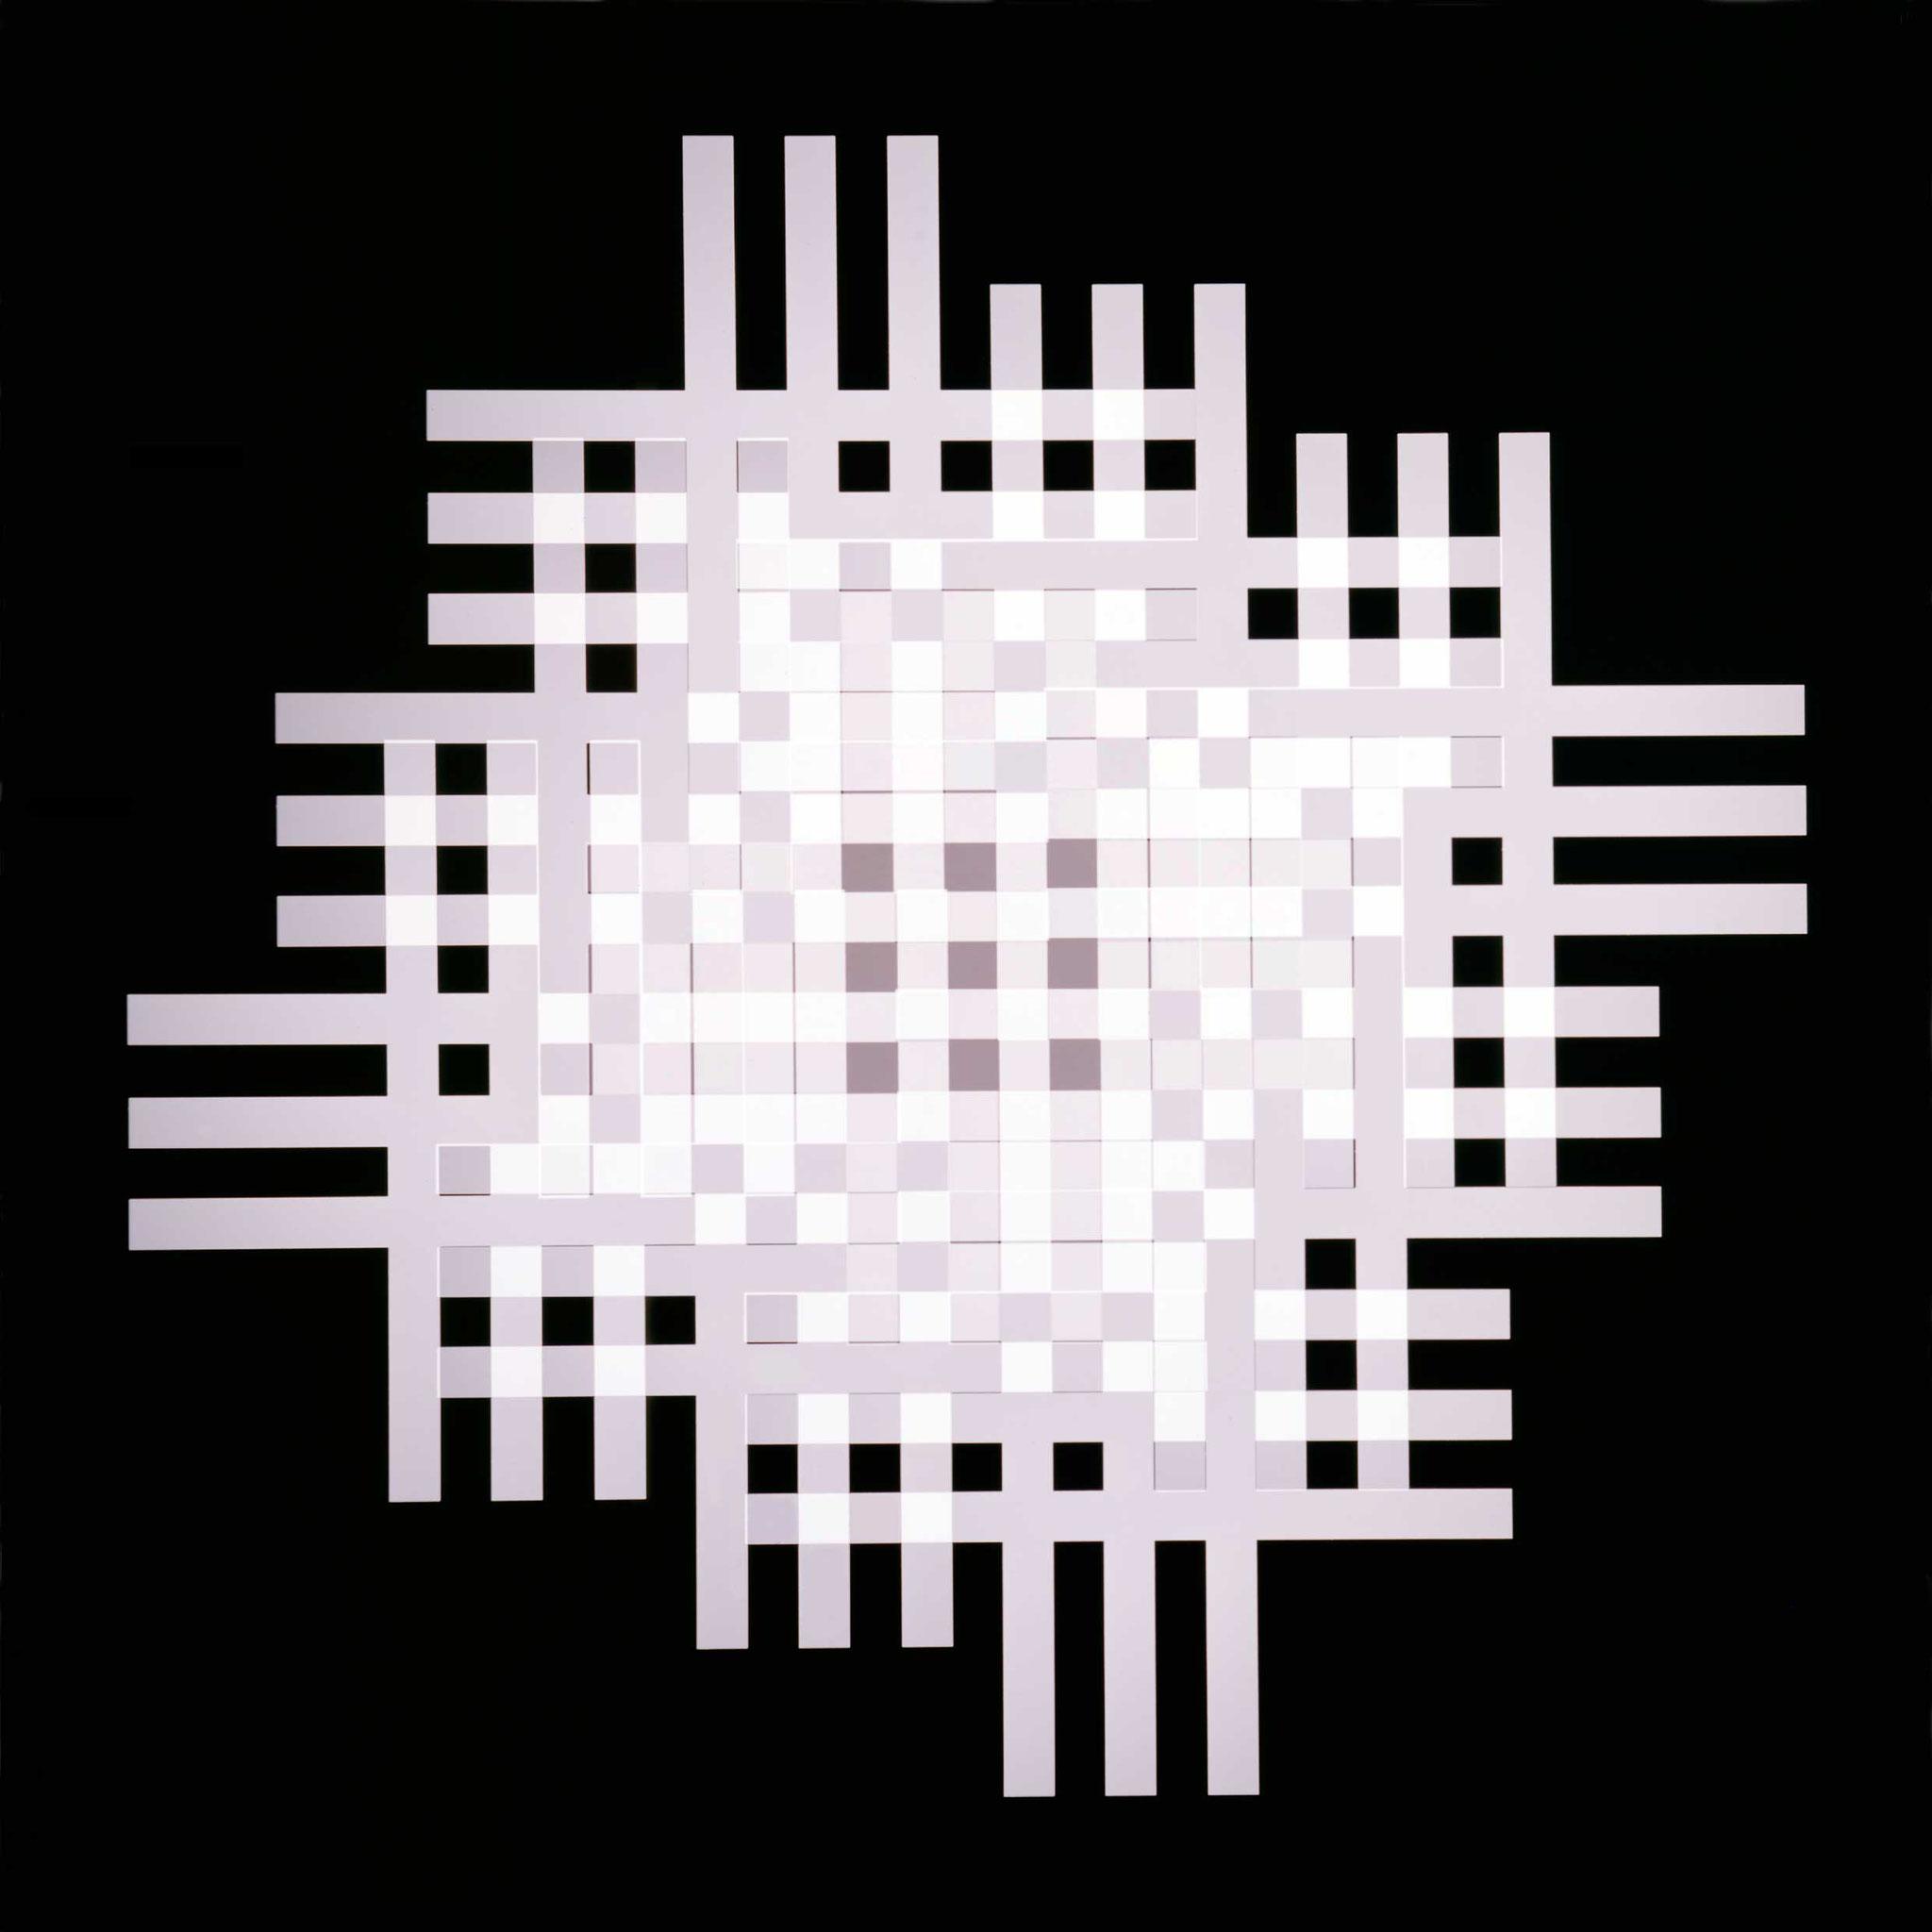 Multipleoptik 4.52.1, 1980